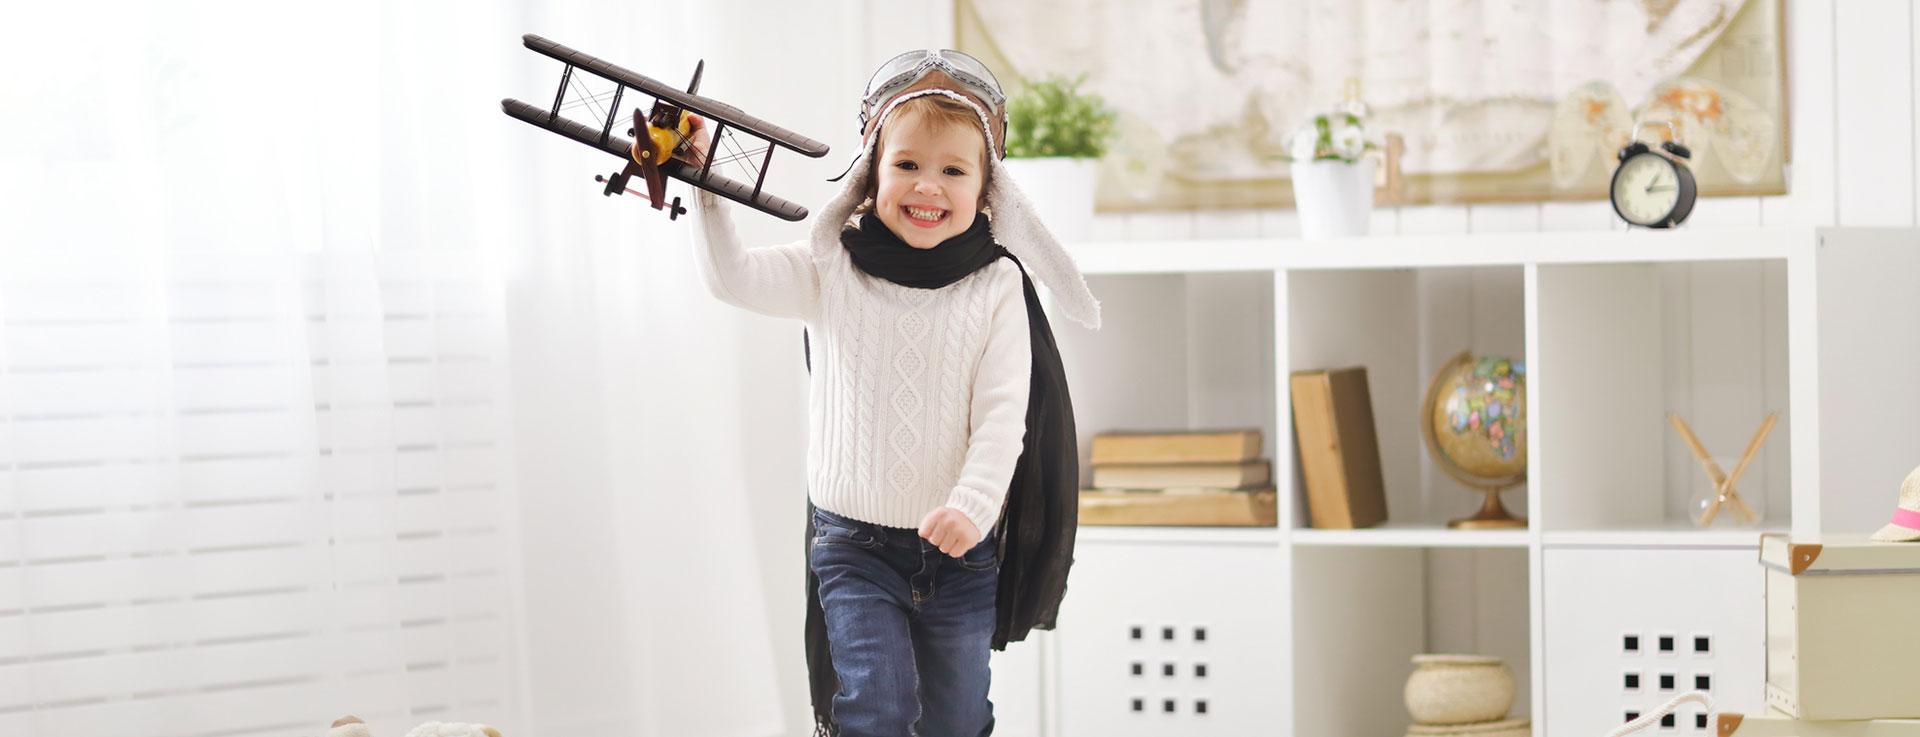 6 actividades mindfulness para niños confinados en casa